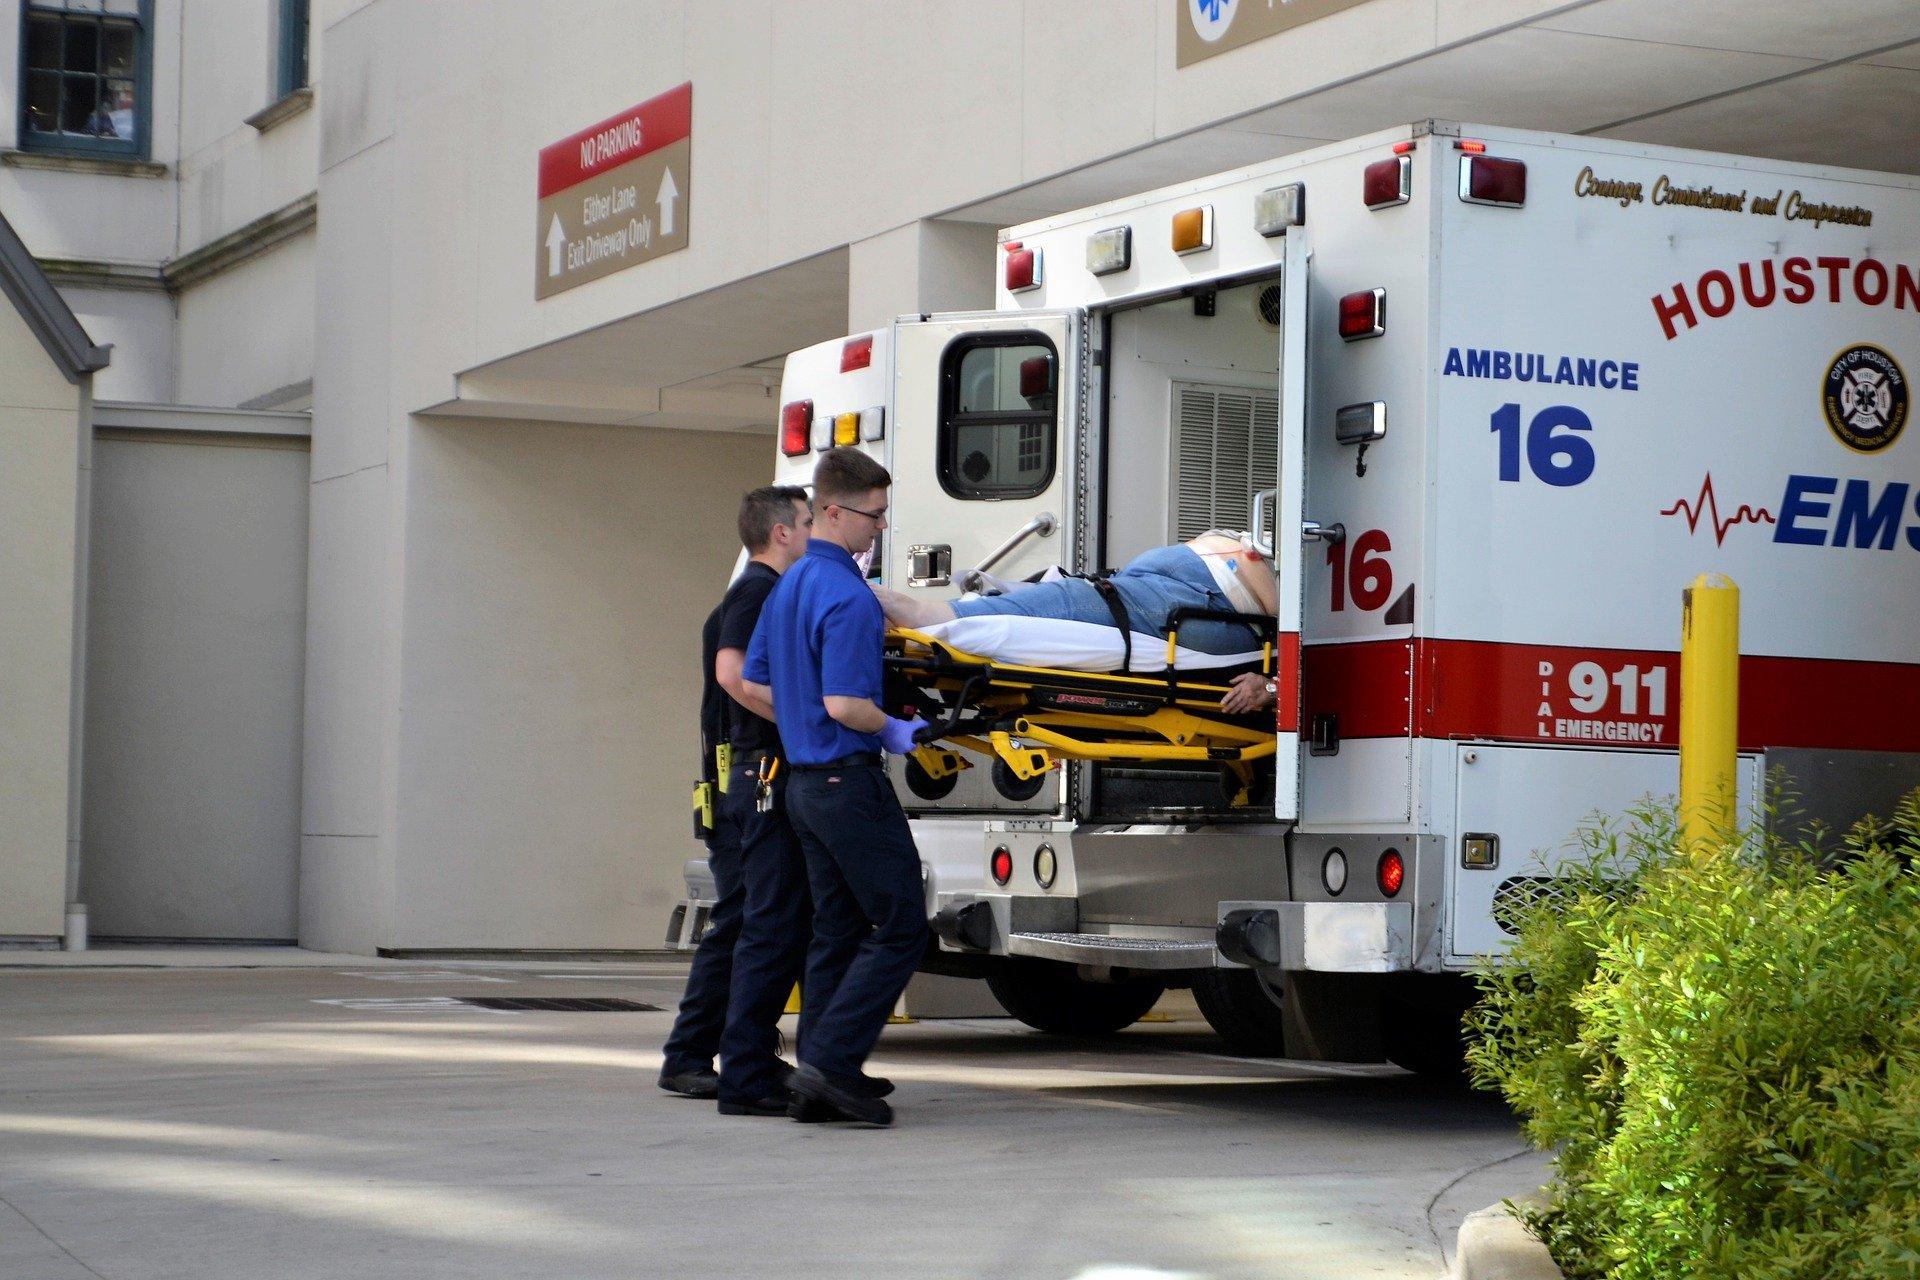 person-stretcher-ambulance